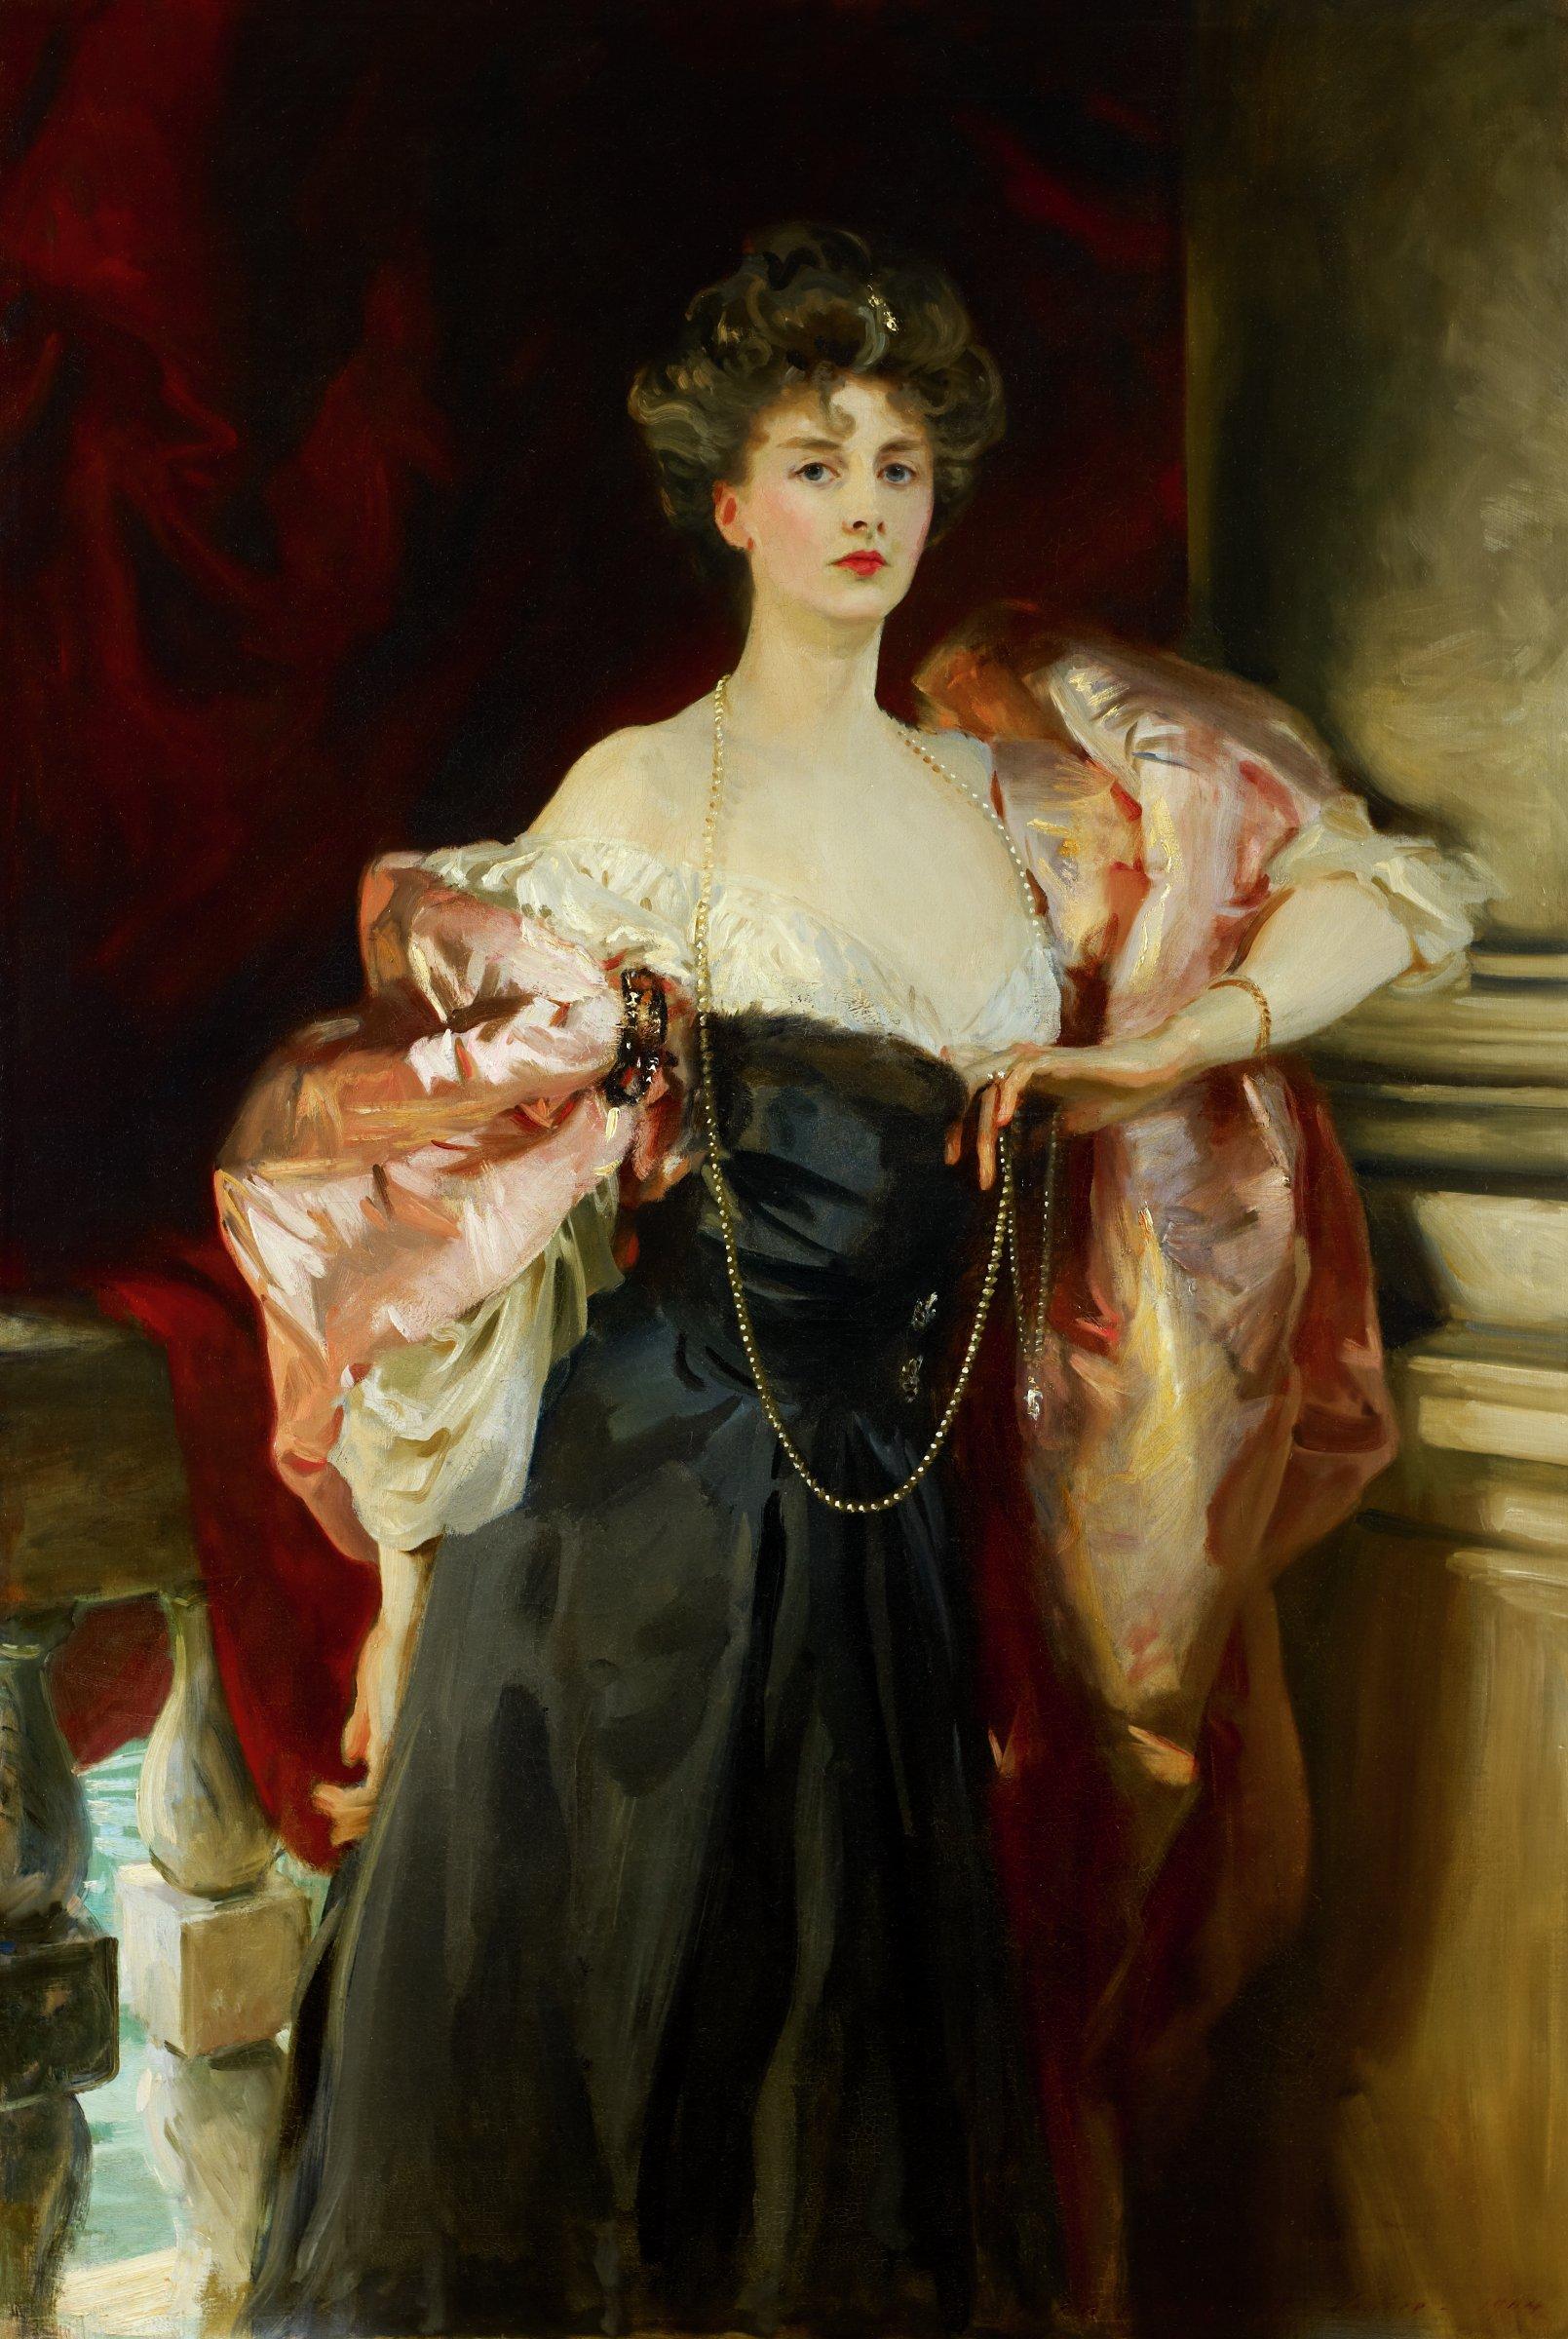 Lady Helen Vincent, Viscountess d'Abernon, John Singer Sargent, oil on canvas